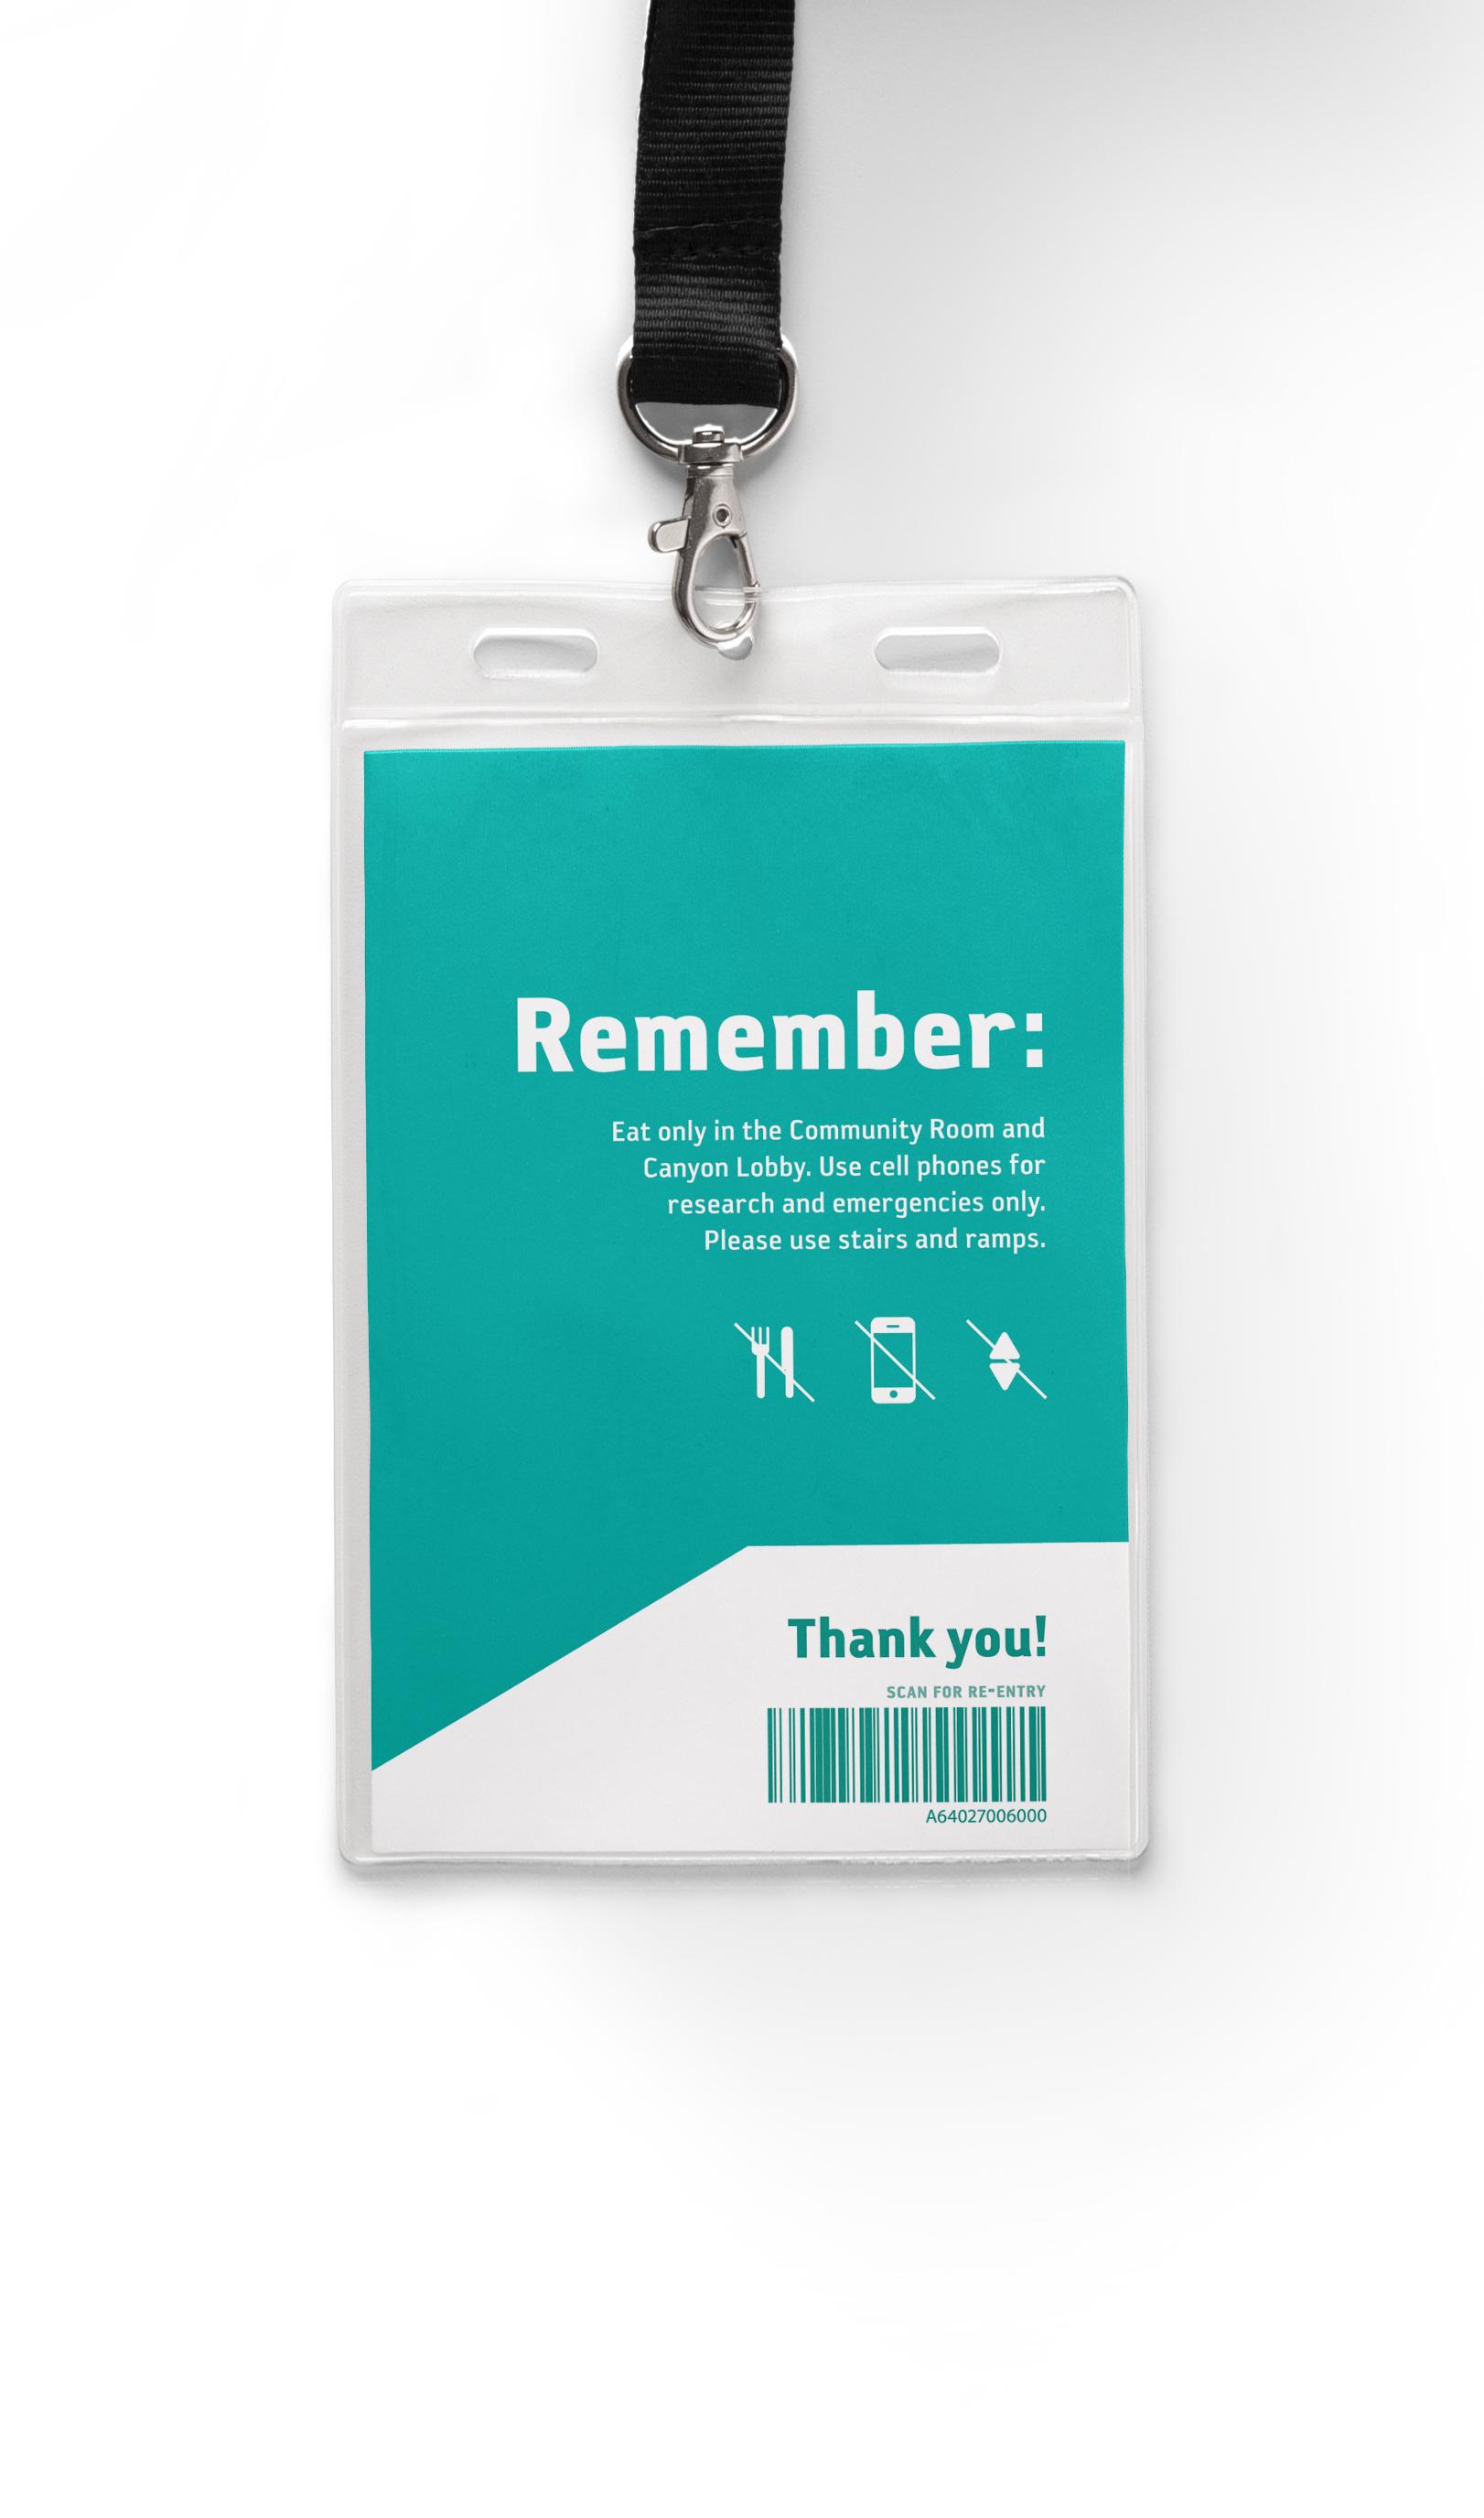 ID-Card-Holder-Mockup-vol-22.jpg